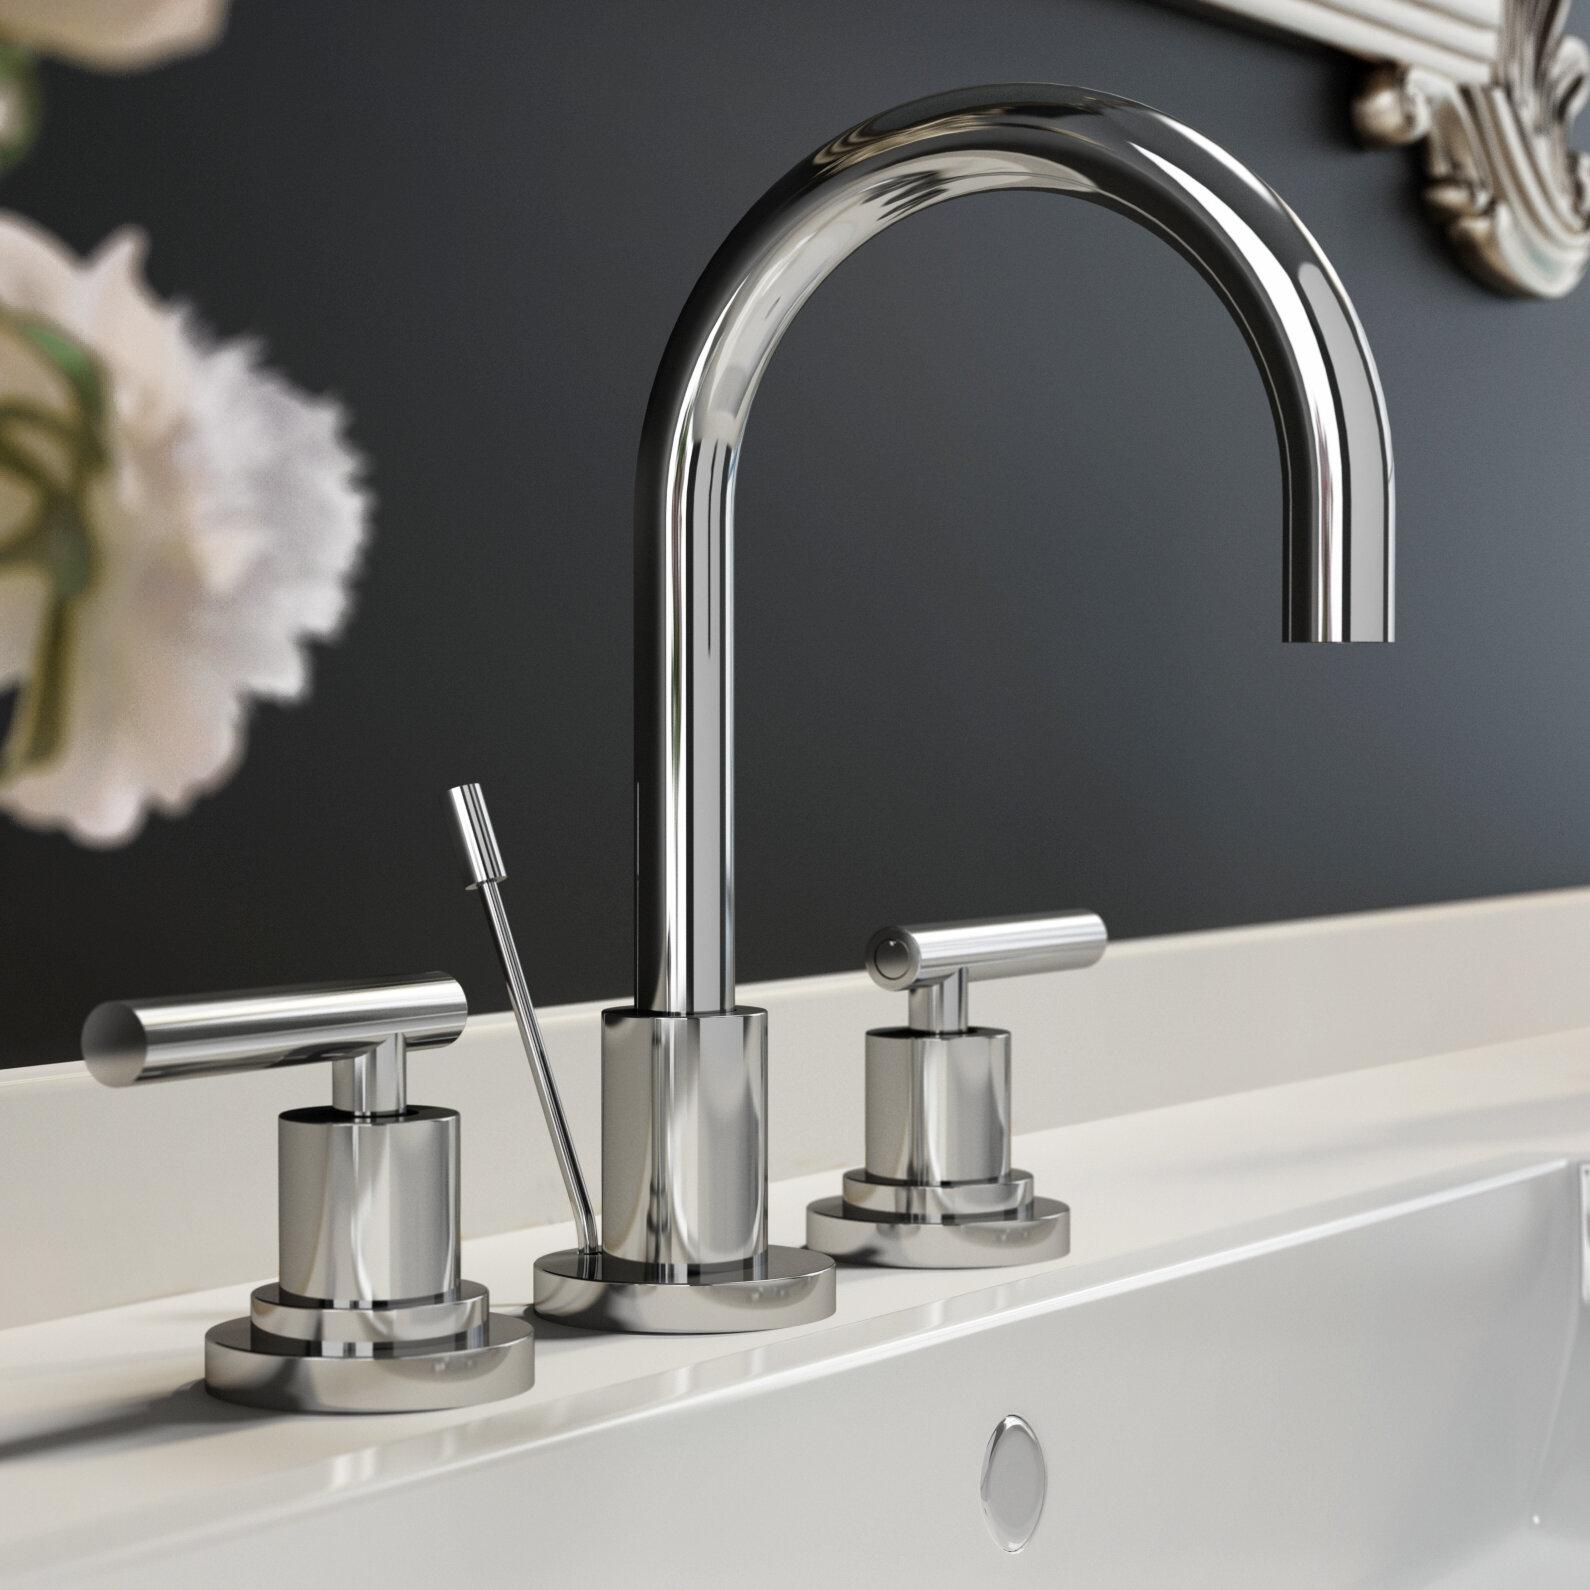 Jacuzzi® Salone Widespread Bathroom Faucet & Reviews | Wayfair